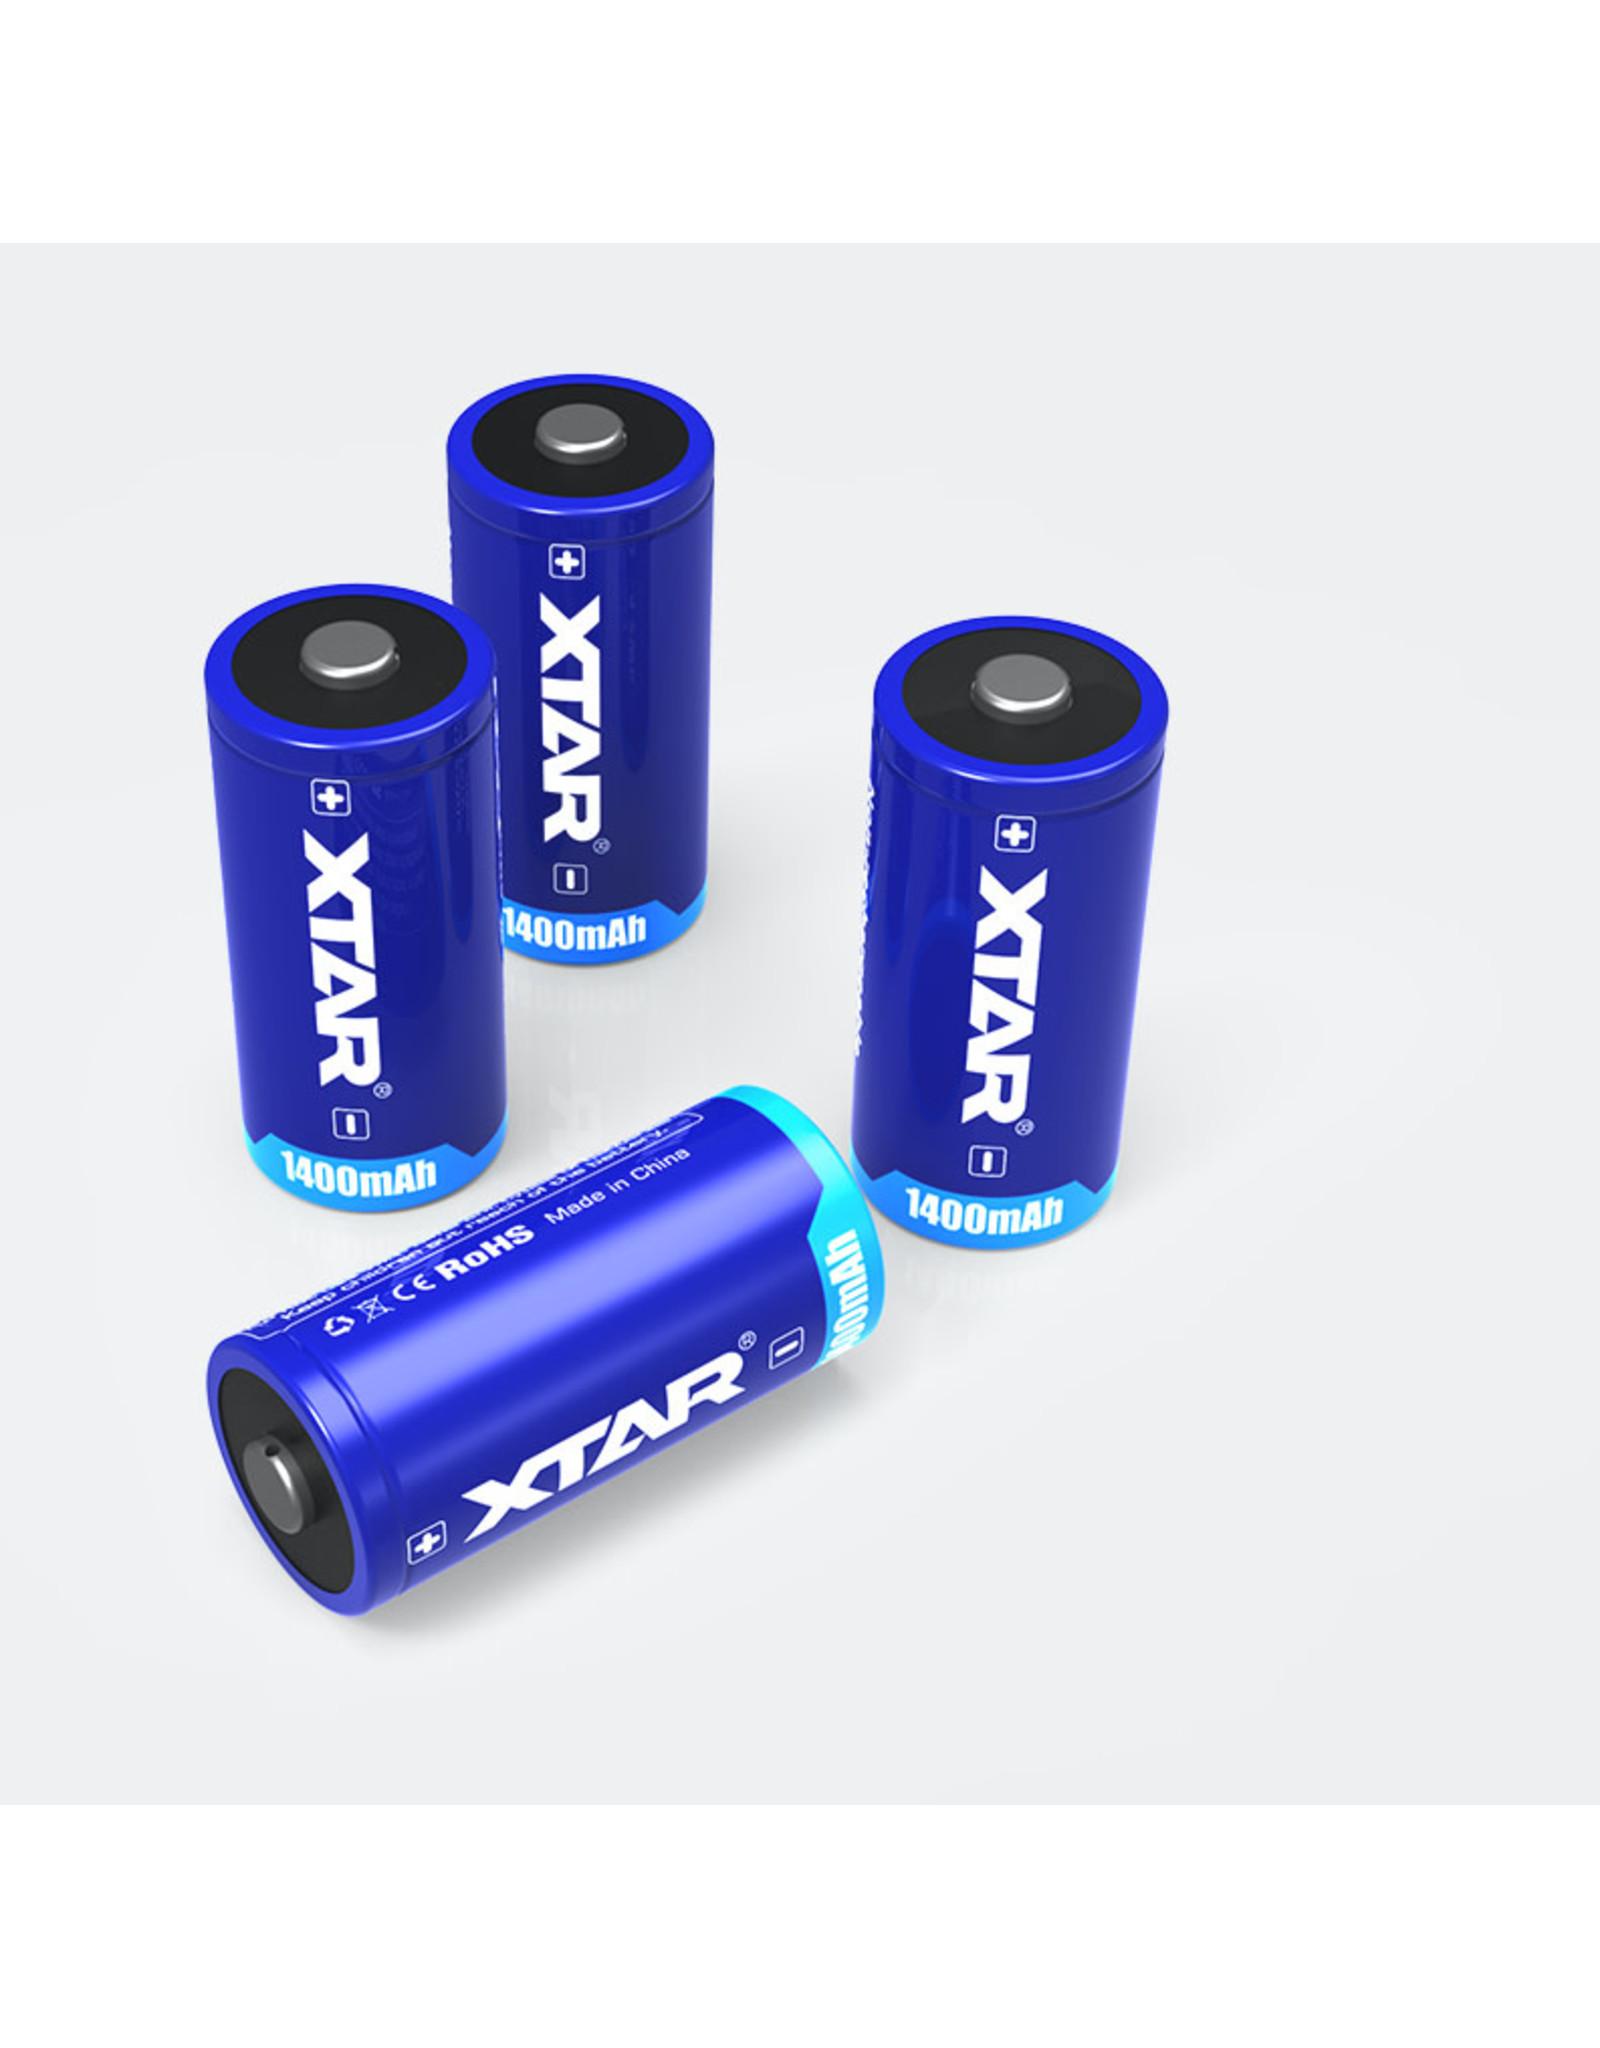 Xtar Xtar cr123 batterijen 1400mAh set van 2